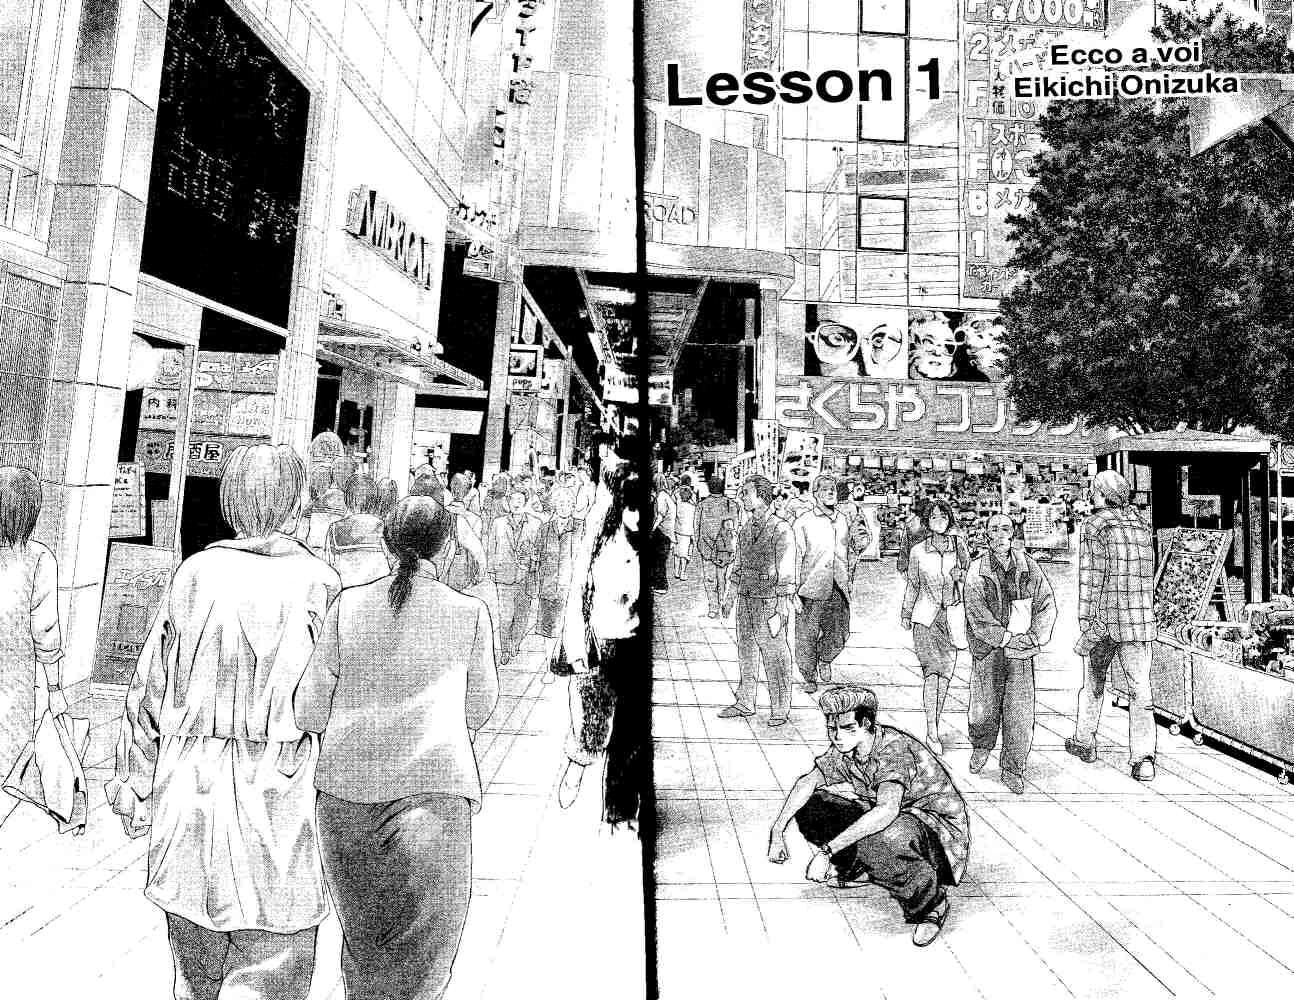 Anime Manga Pilgrimage Gto Great Teacher Onizuka Youinjapannet